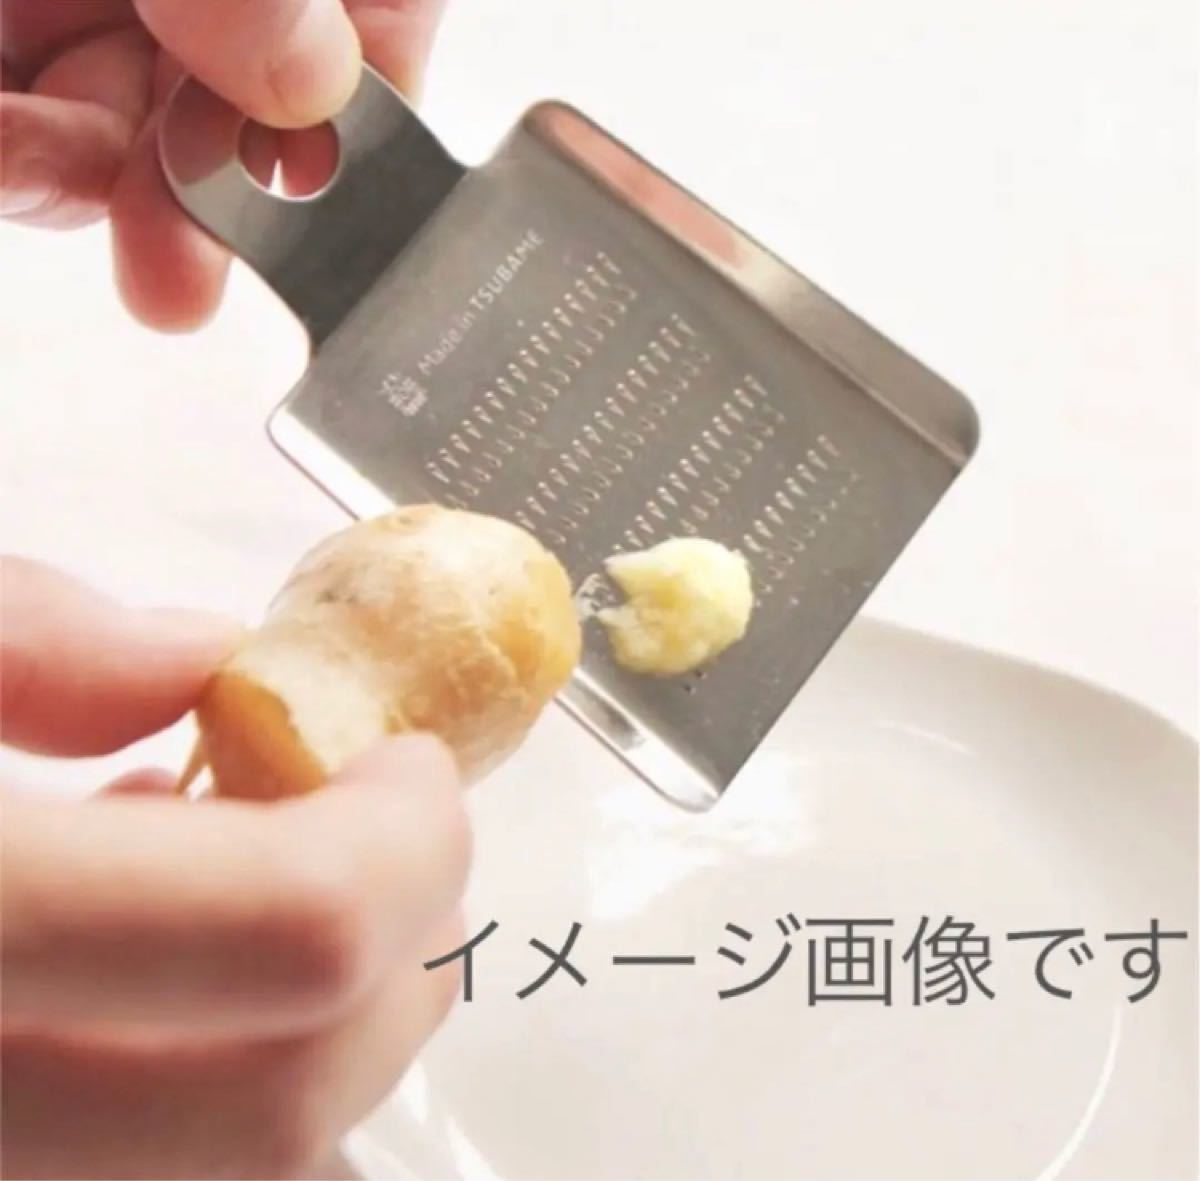 Made in TSUBAMEミニおろし金 新品 薬味おろし器 日本製 新潟県燕市燕三条